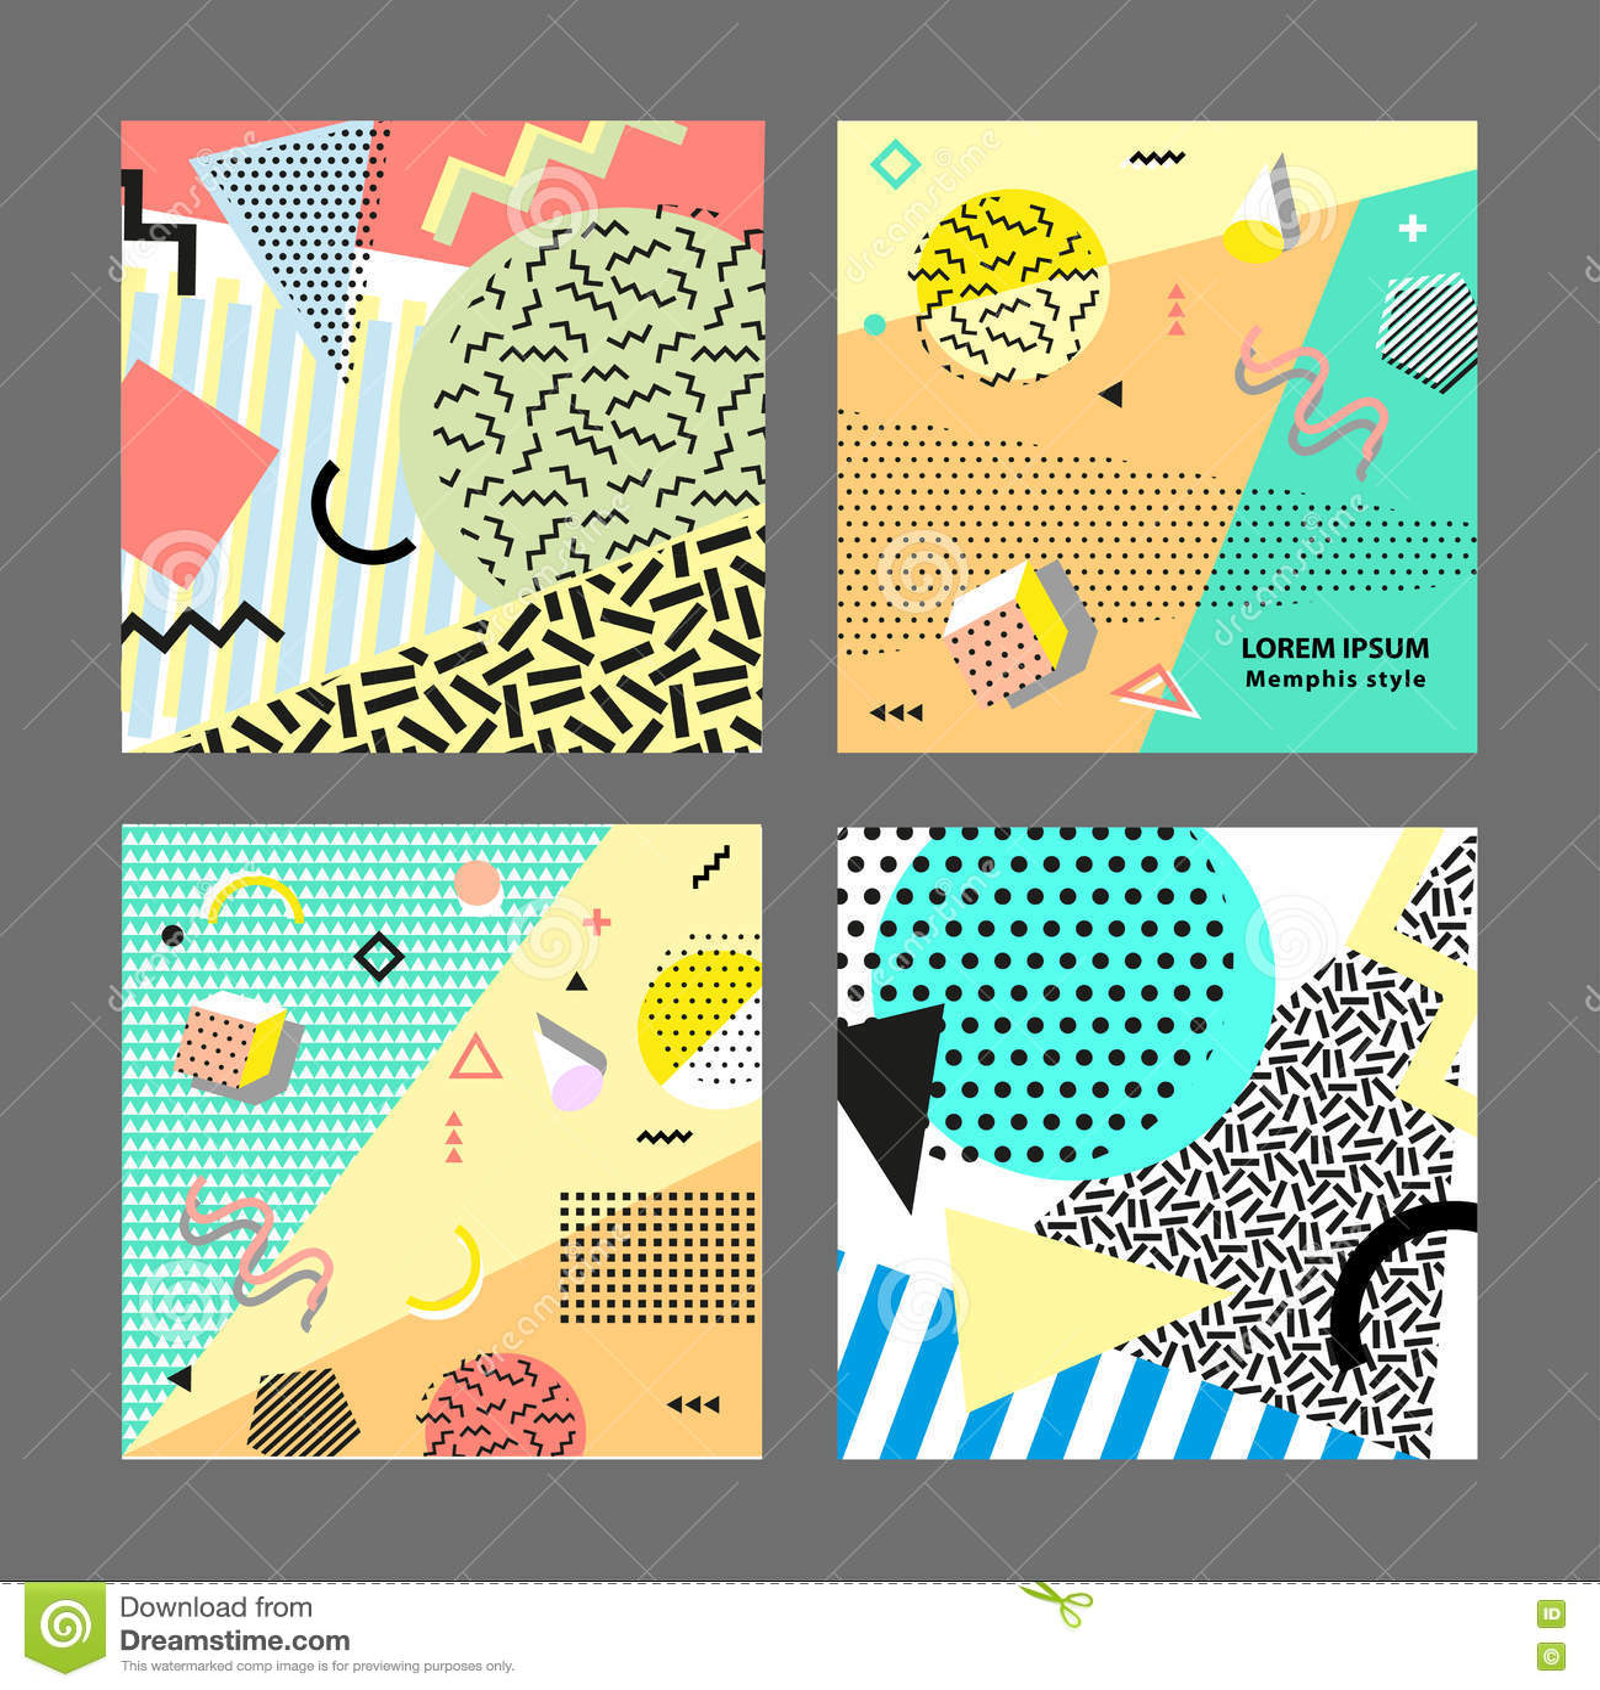 80s poster design - Download